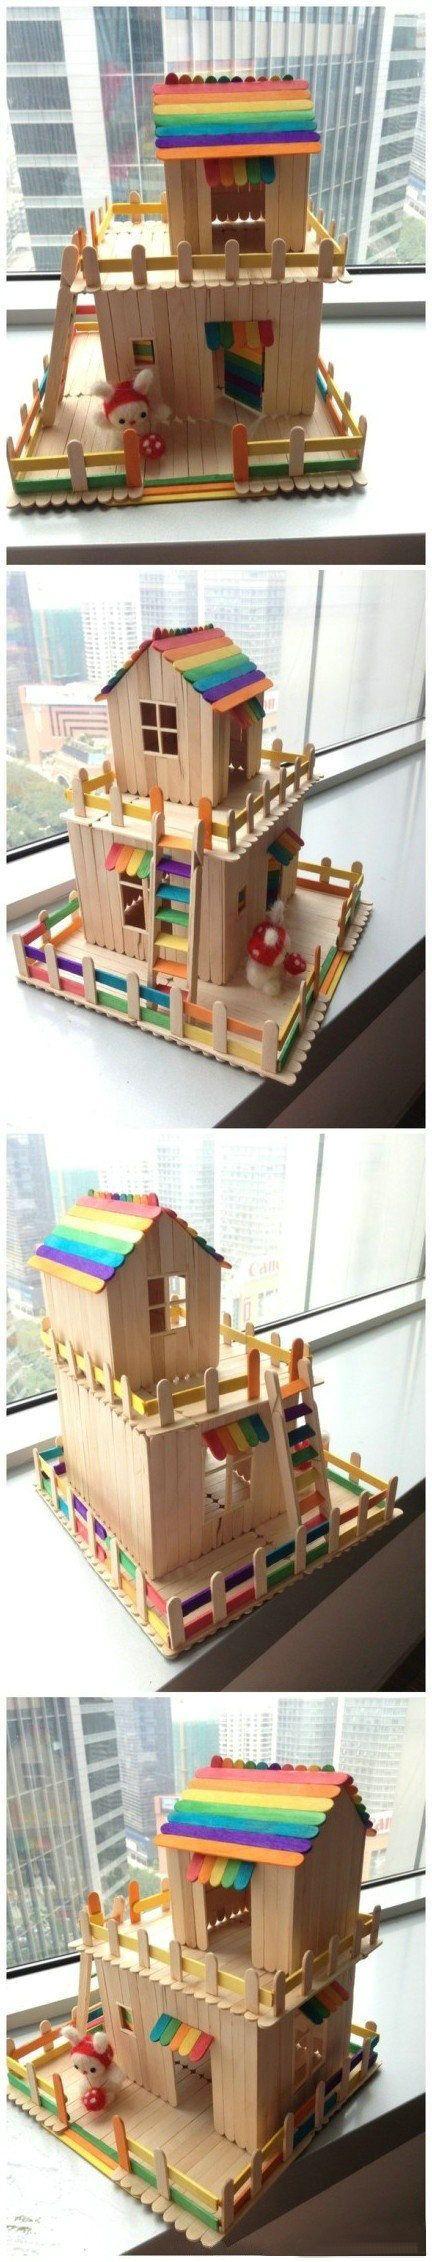 Craftsticks House, awesome!